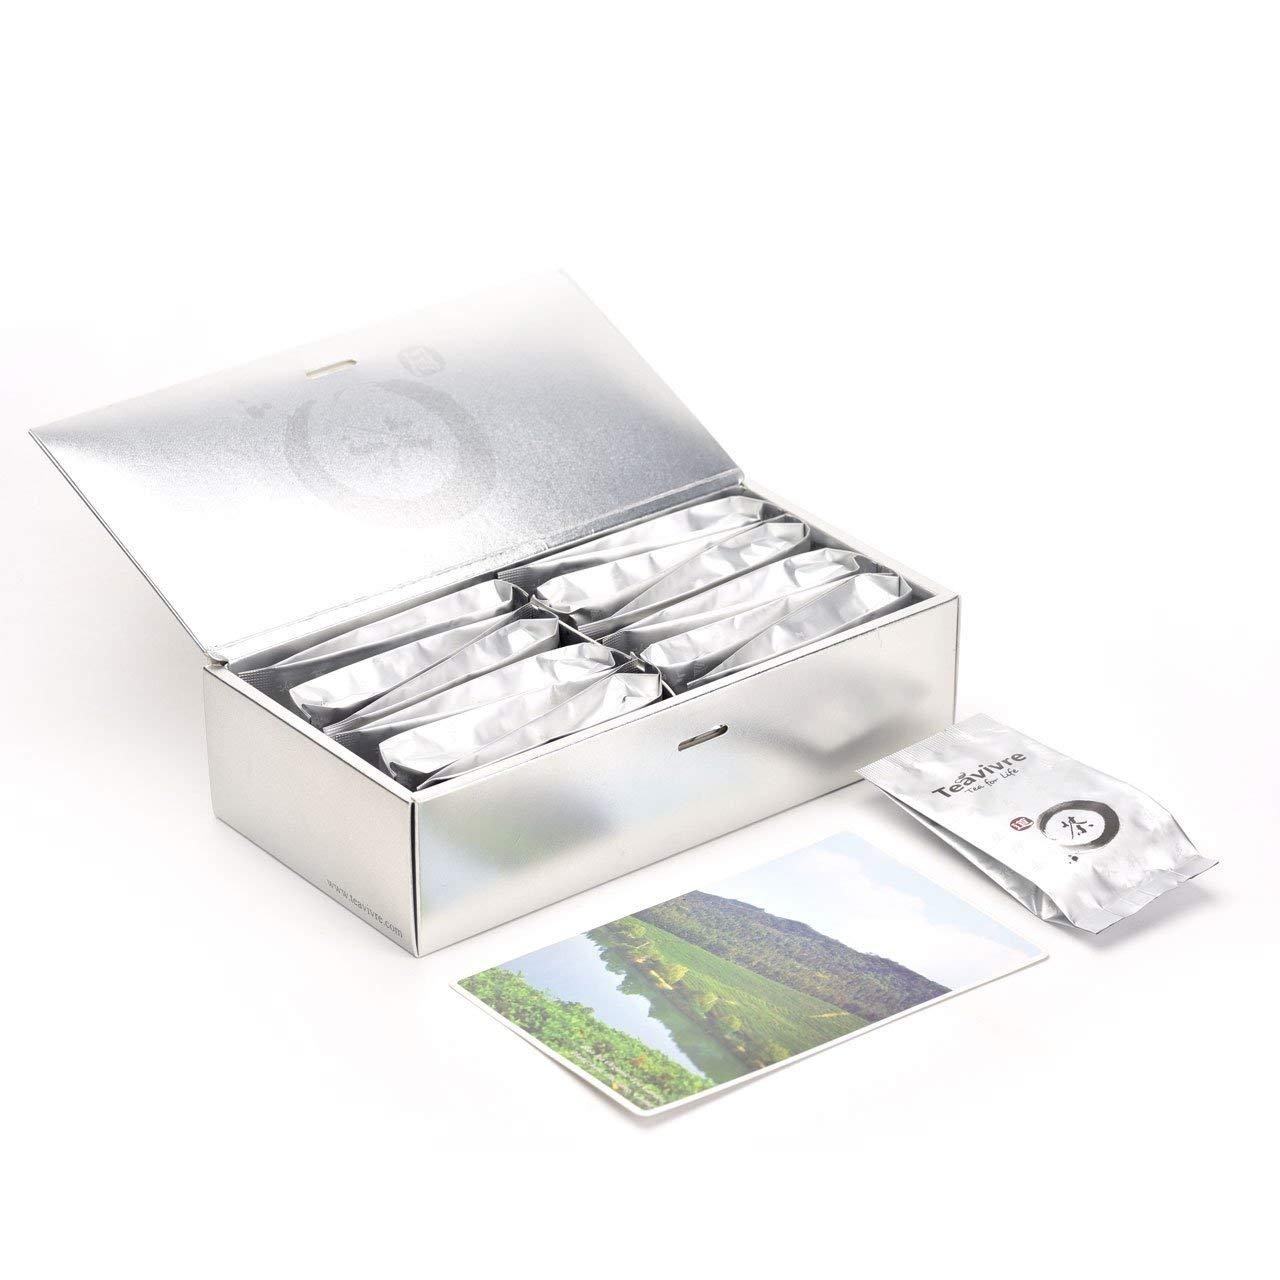 Teavivre Featured Tea Sampler Gift Assortment - Classic Tea Variety Gift Box